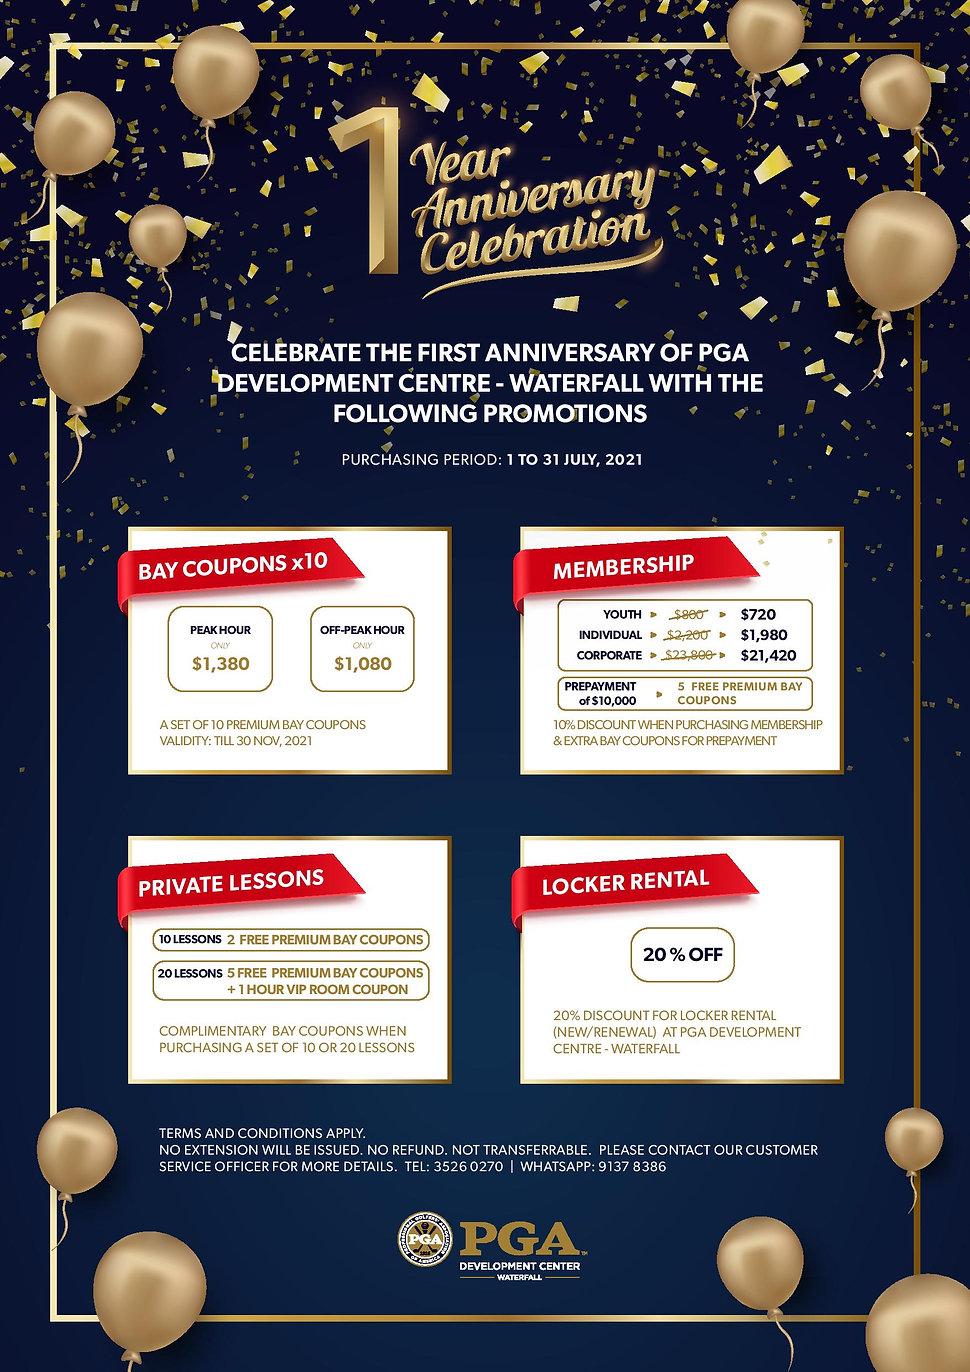 PGA Development Center - Waterfall 1st Anniversary Promotion-page-001.jpg